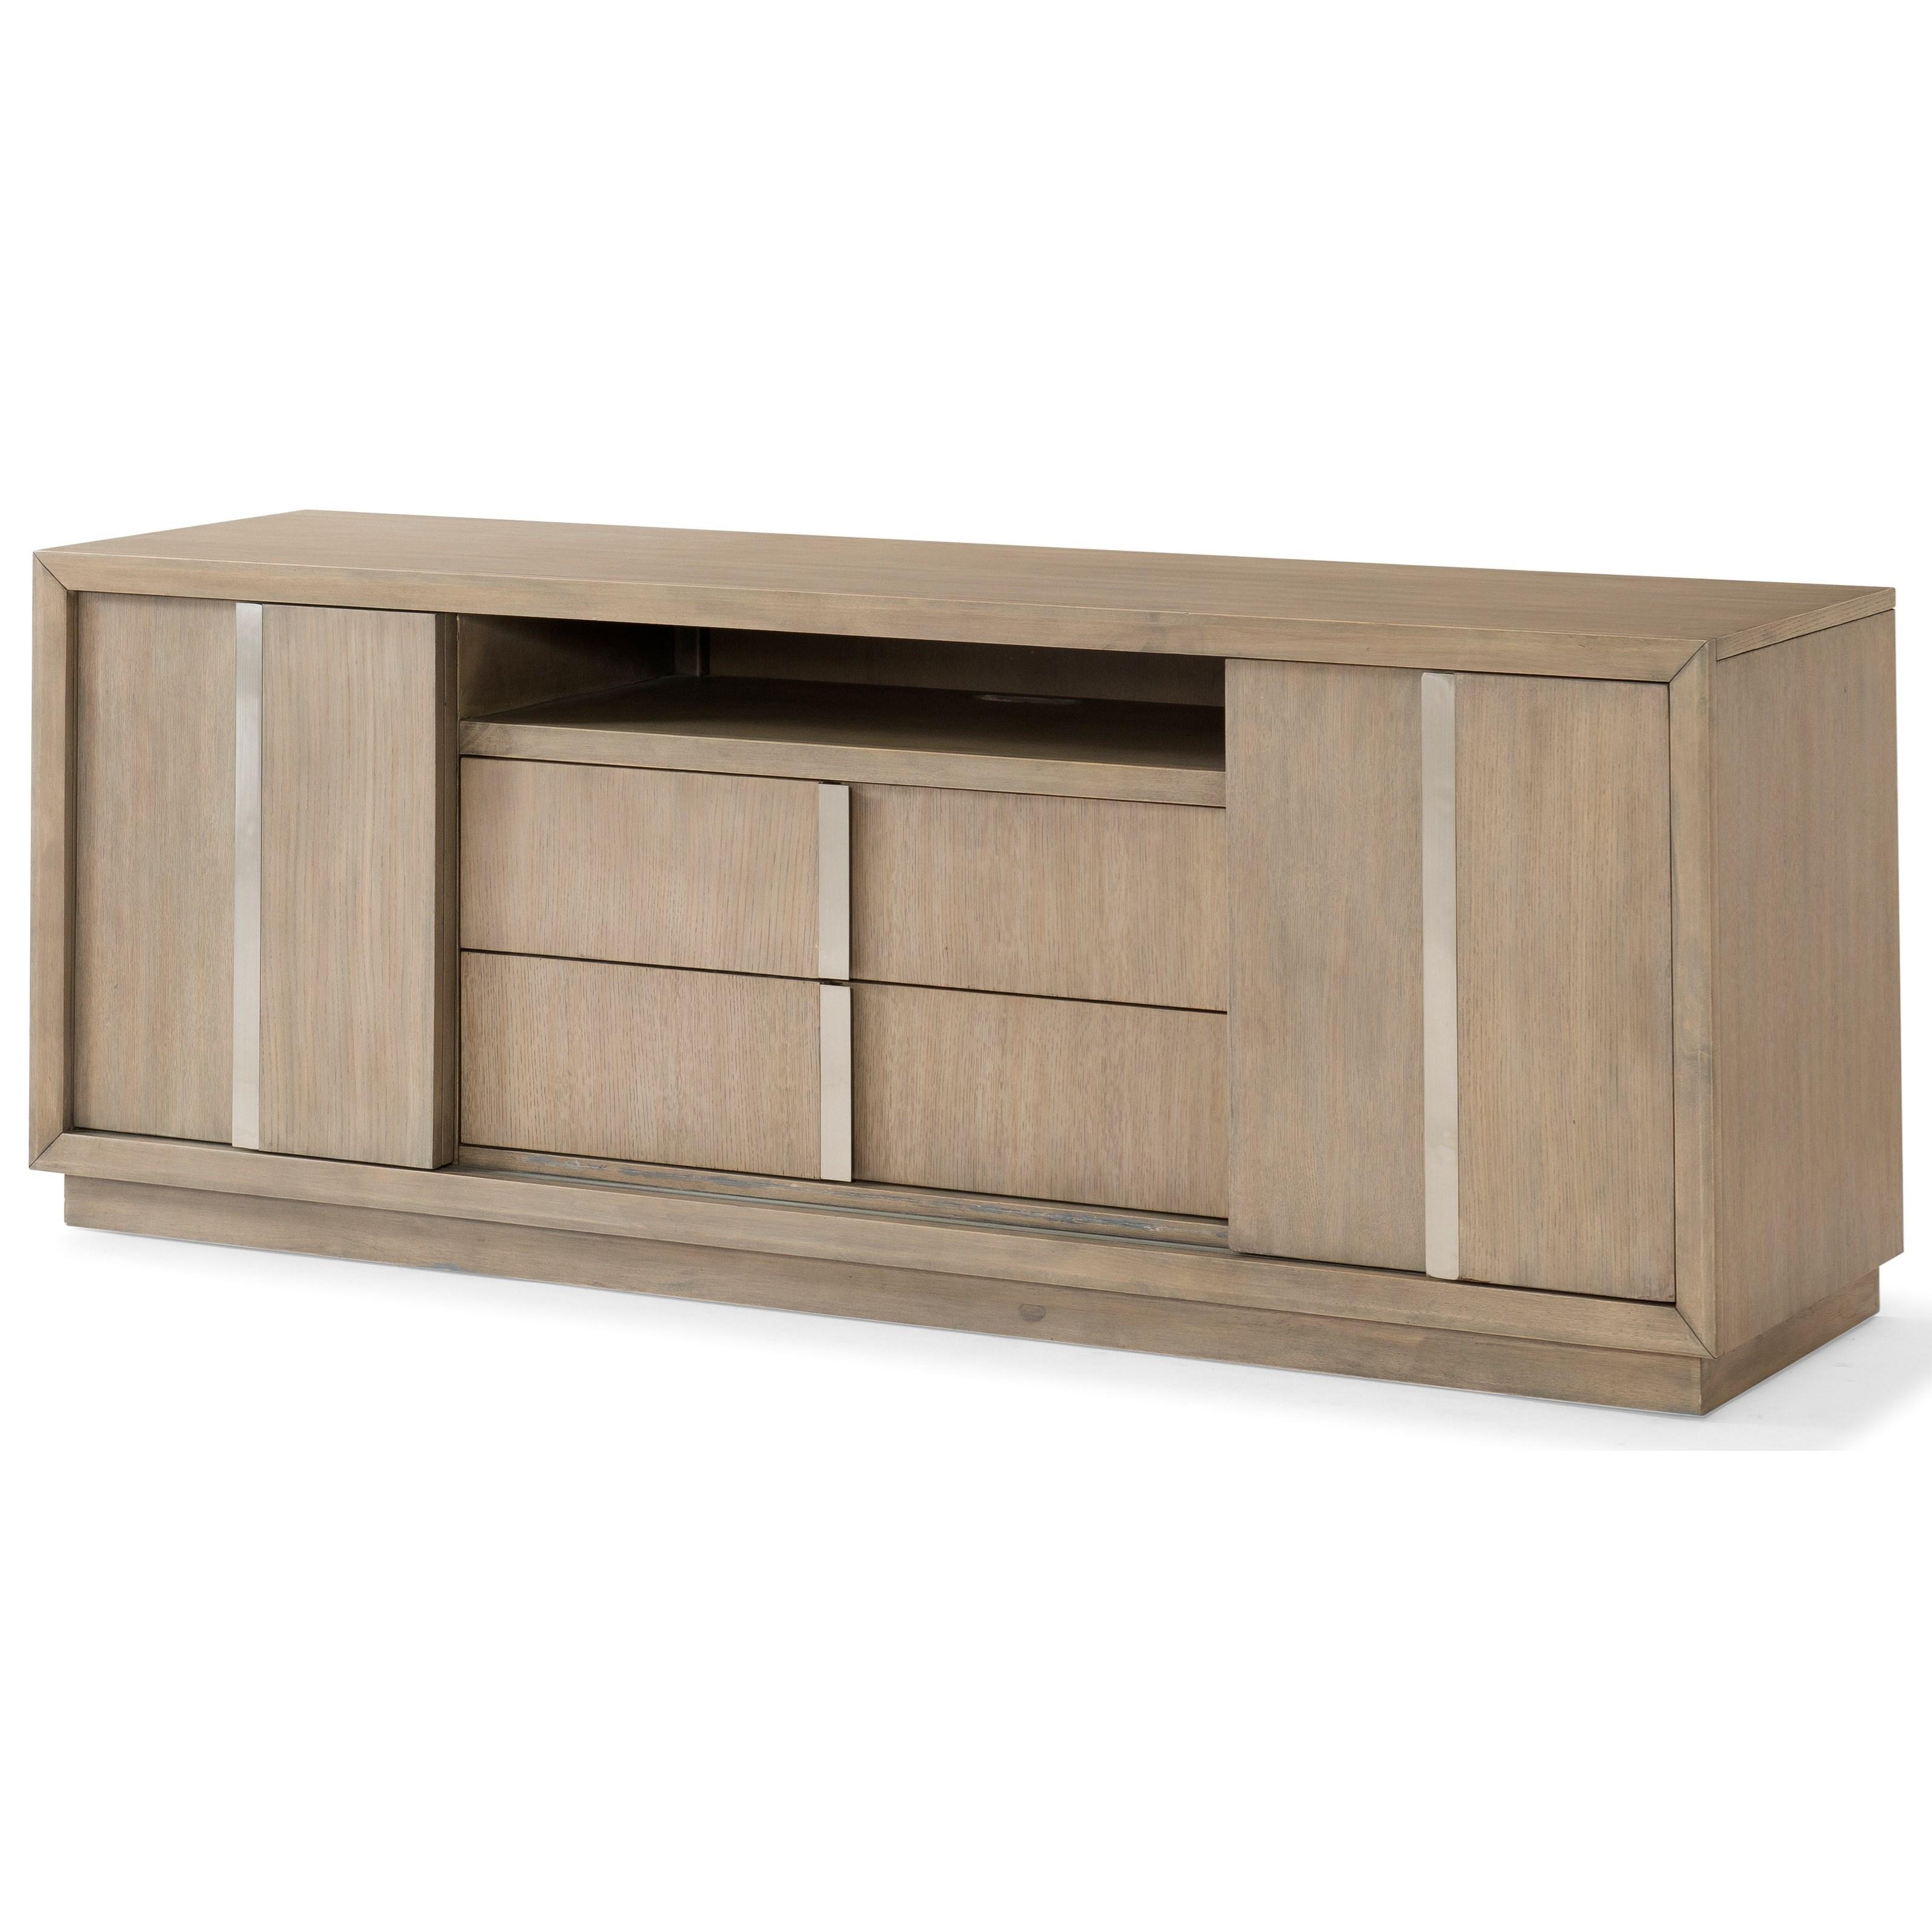 Melbourne TV Console by Klaussner International at HomeWorld Furniture